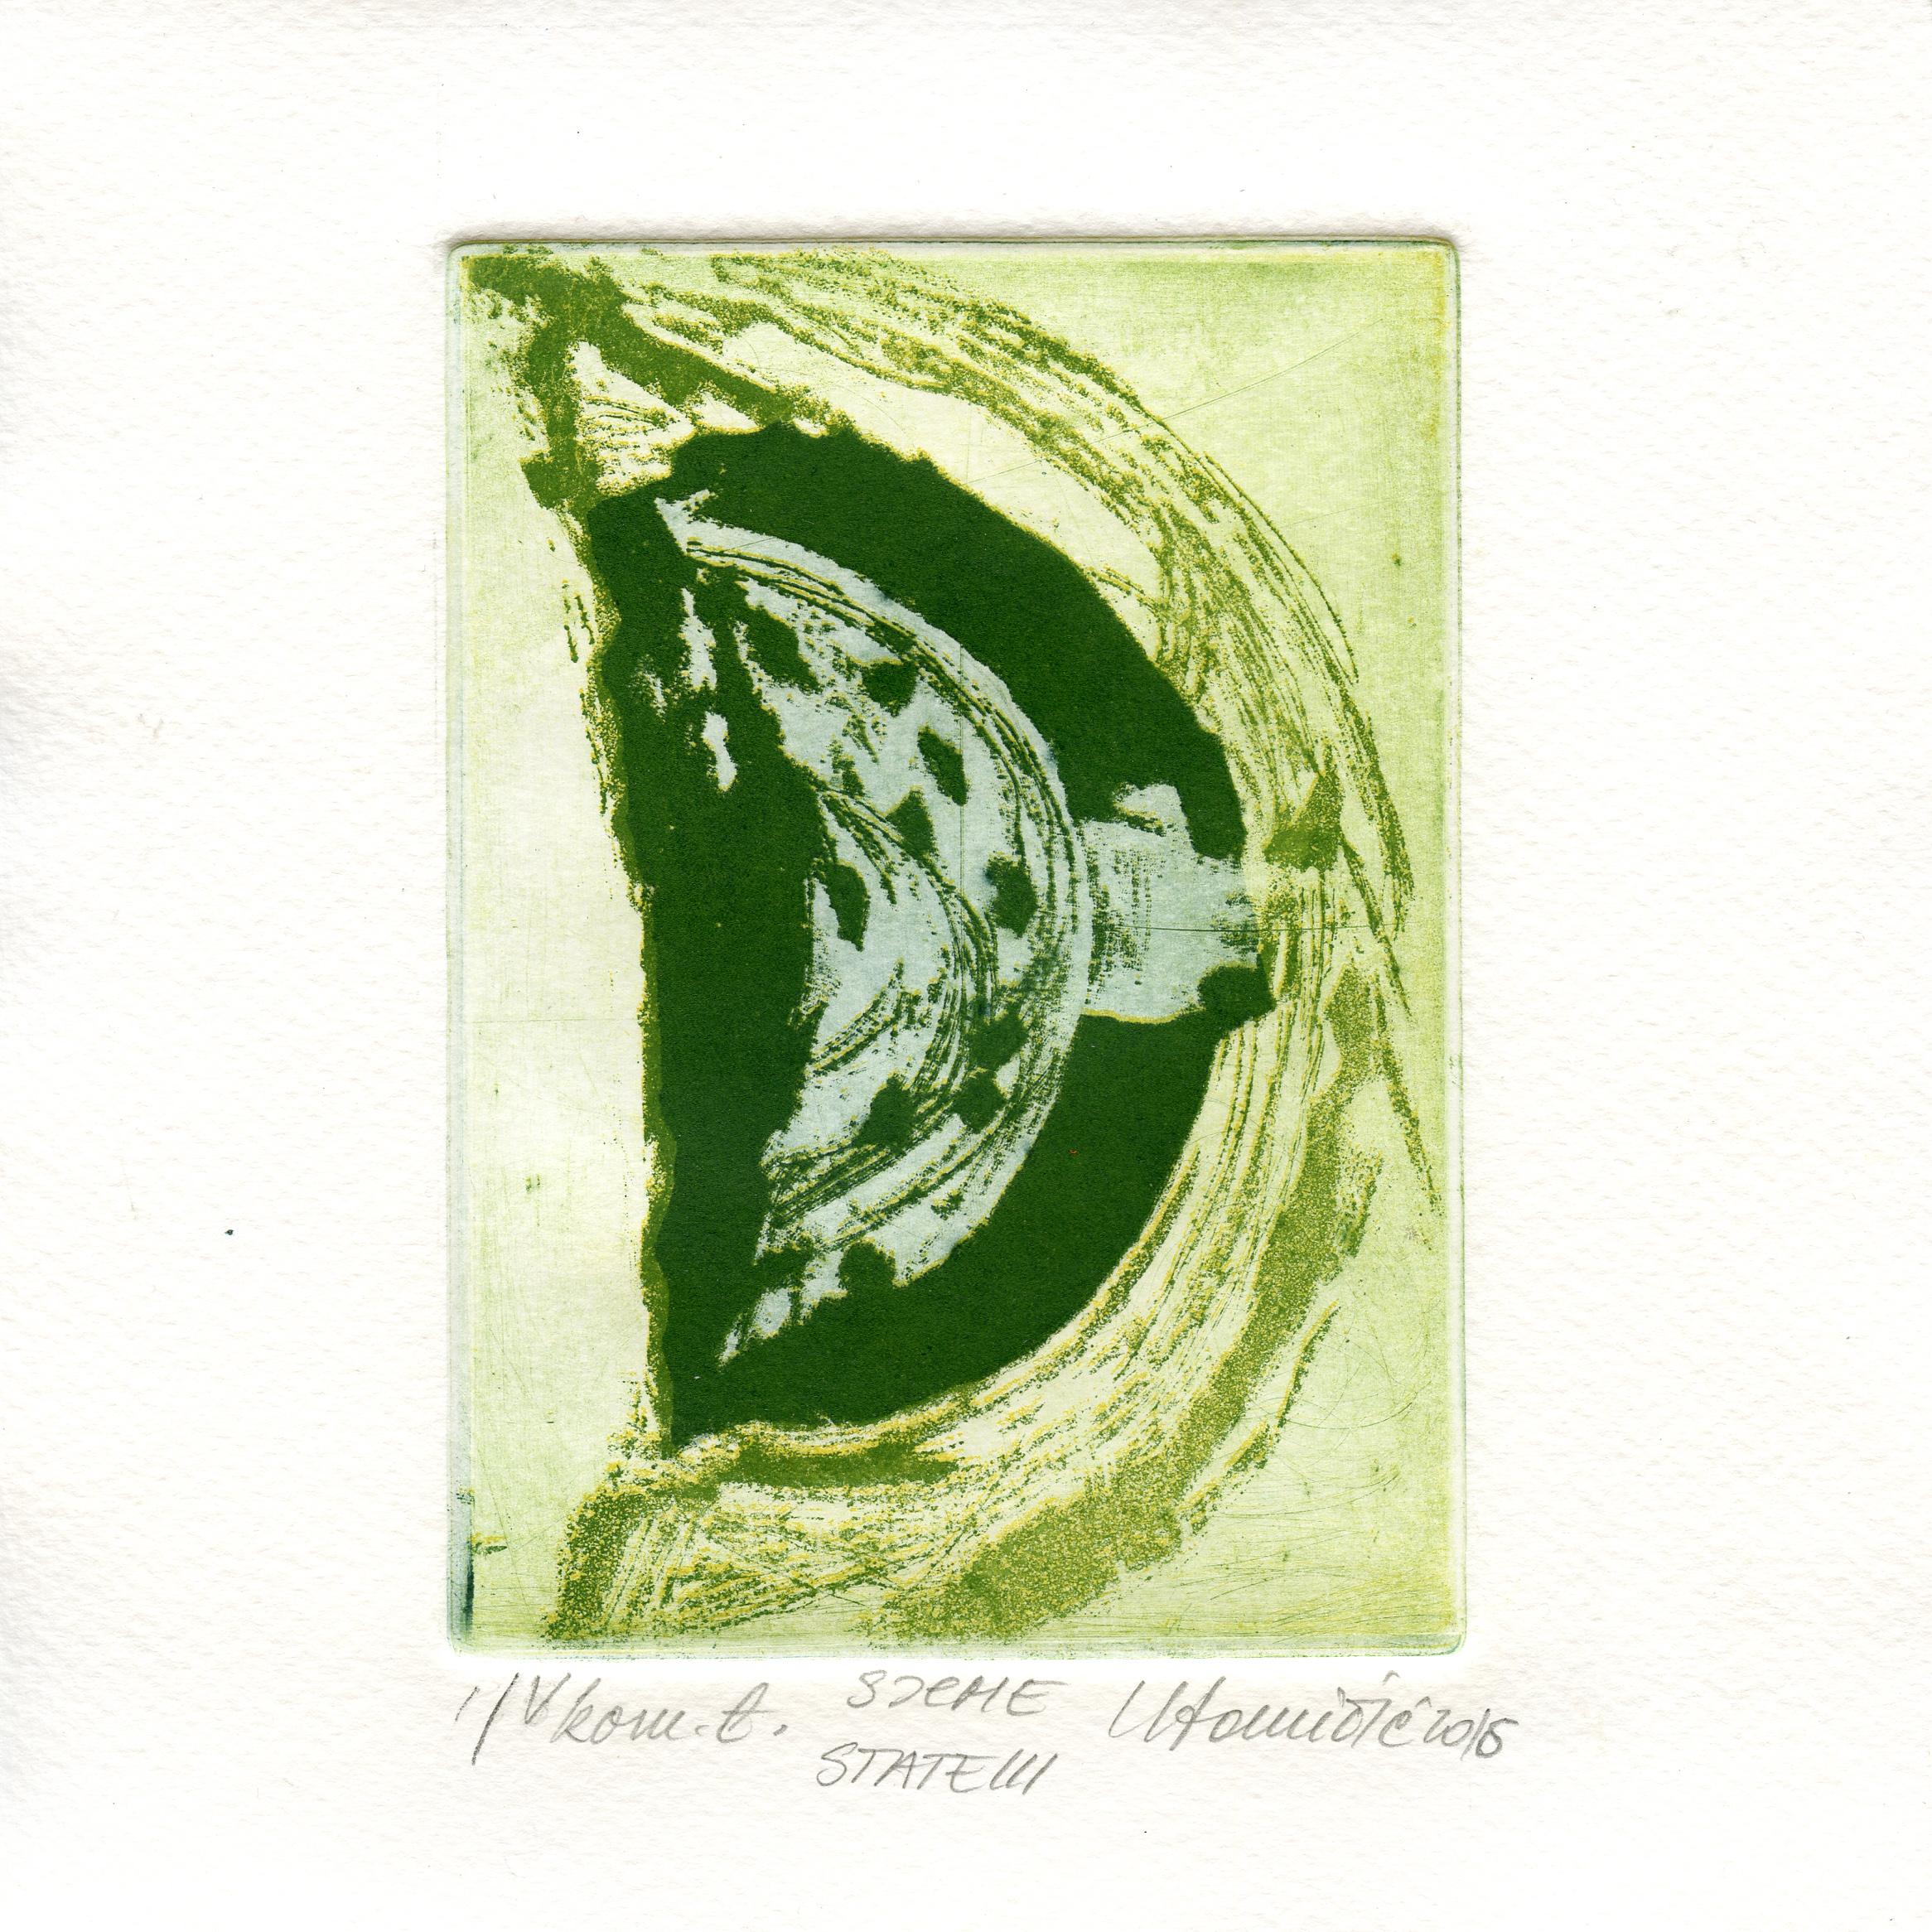 Tomicic, Ksenjia - Seed - etching, aquatint